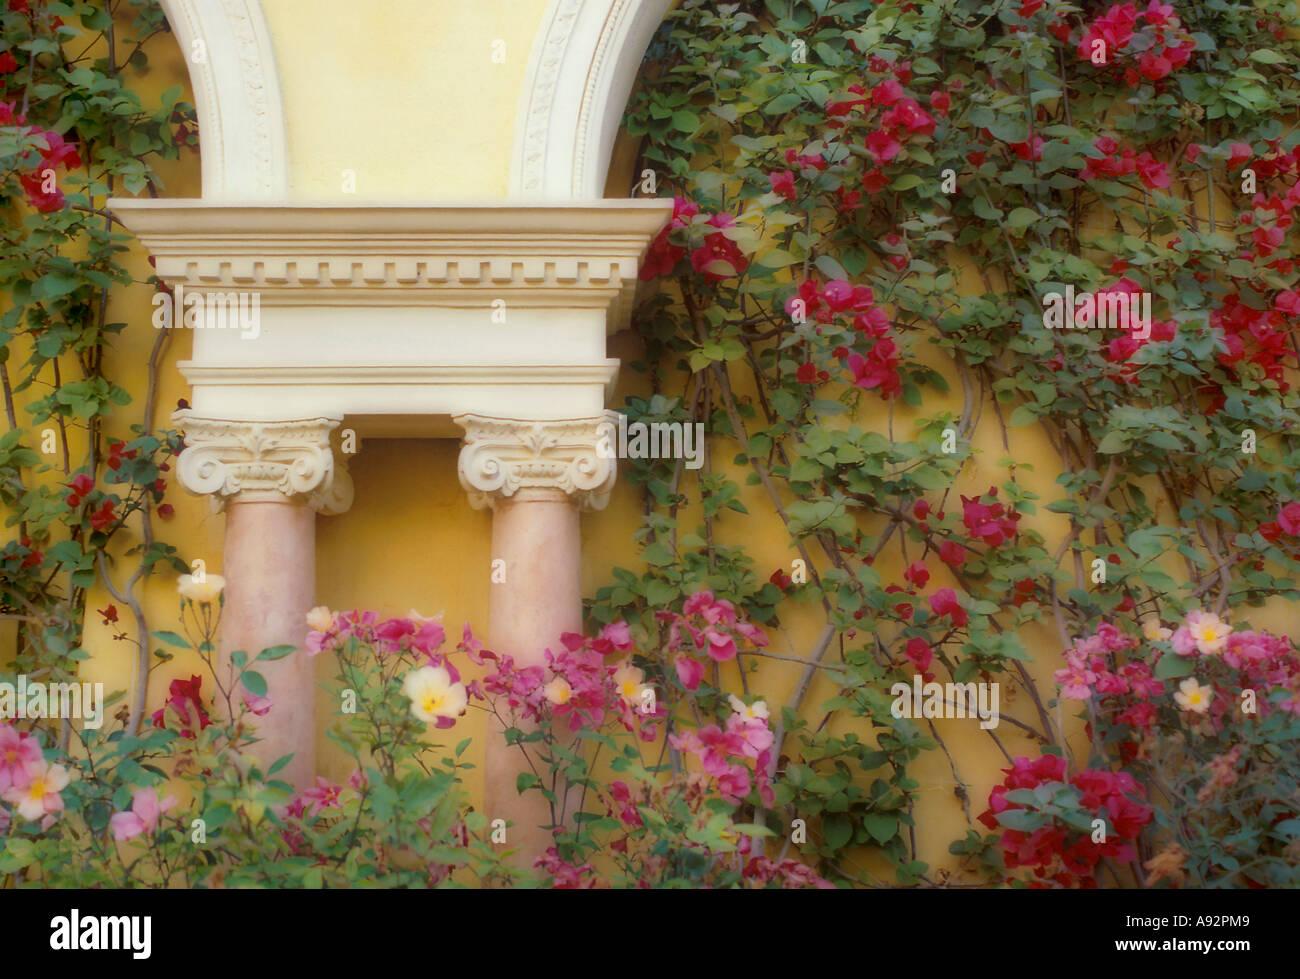 Villa Ephrussi de Rothschild  Saint-Jean-Cap Ferrat  France - Stock Image